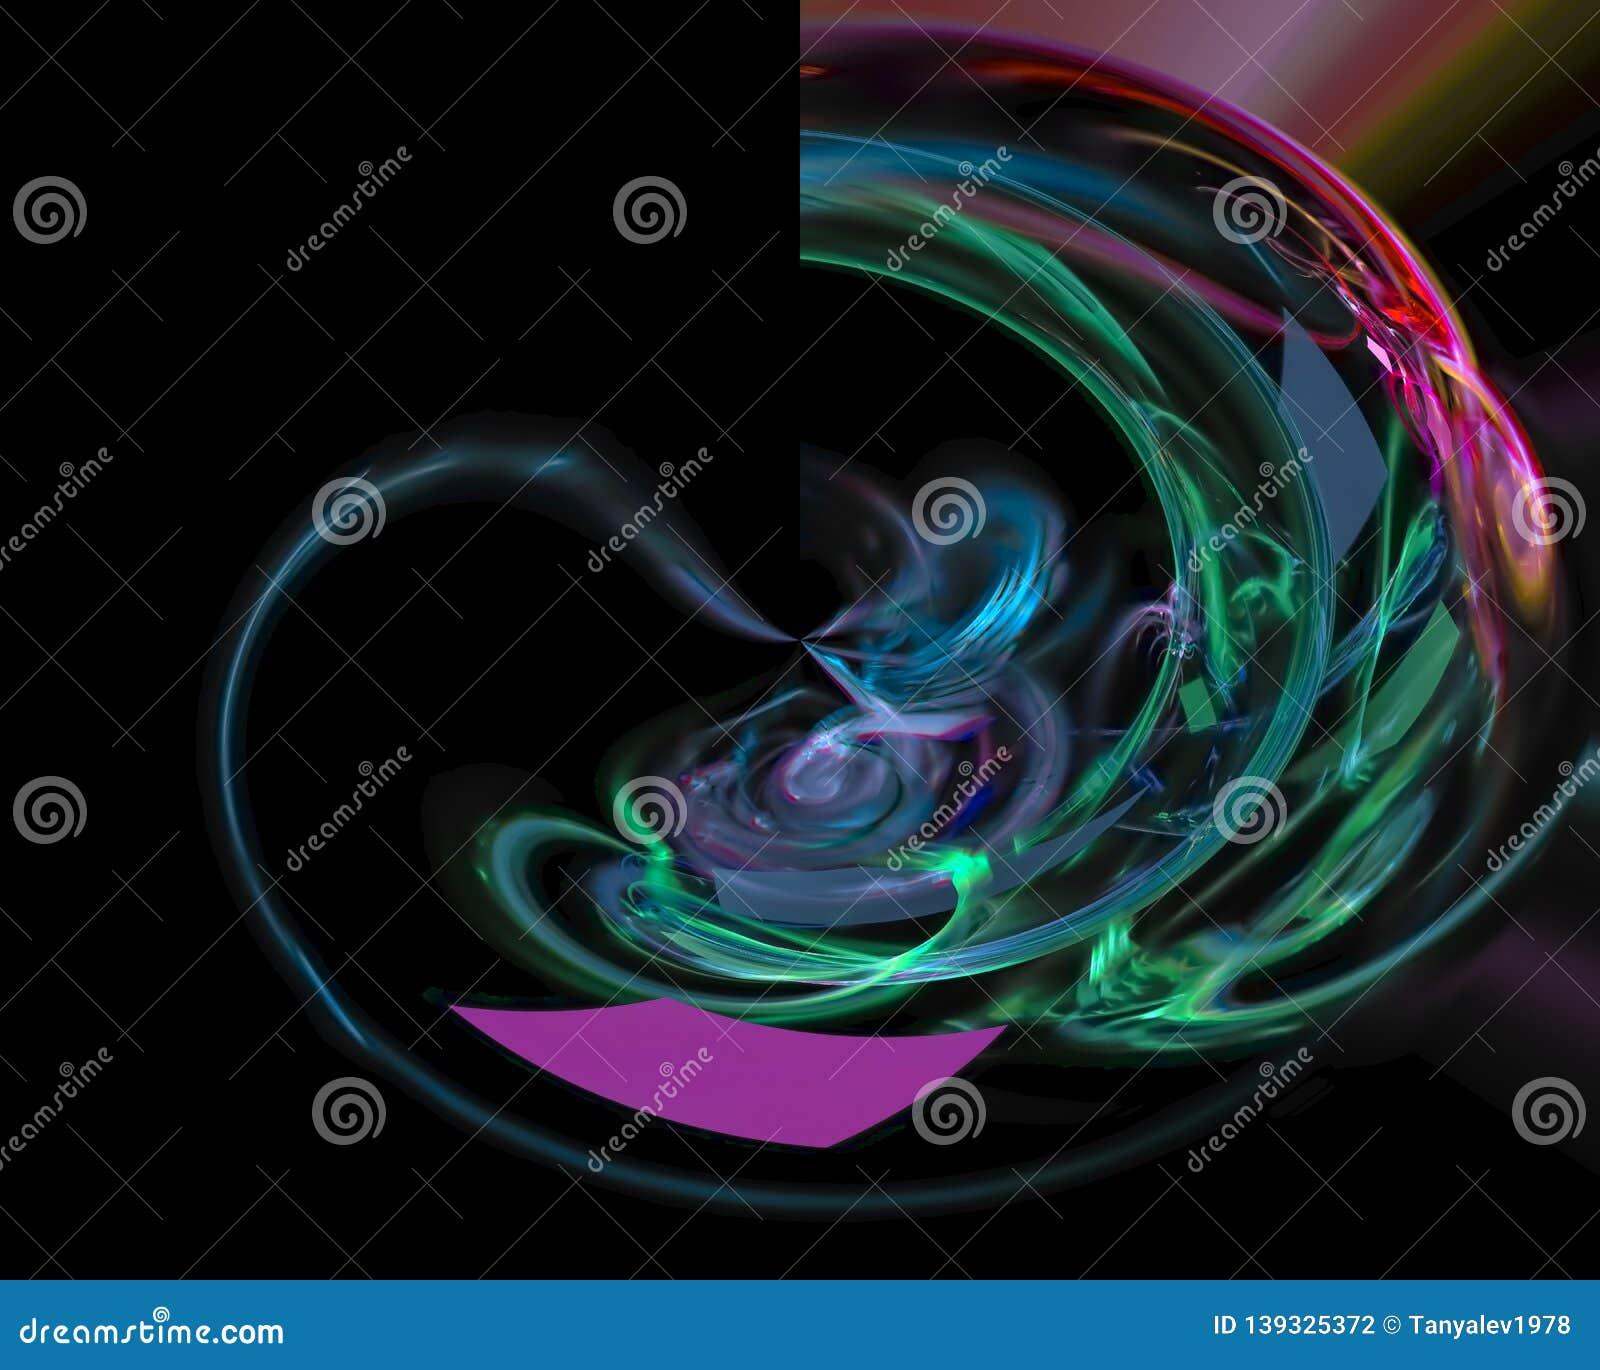 Digital abstract fractal wallpaper power , fantasy template design dark, artistic style shape